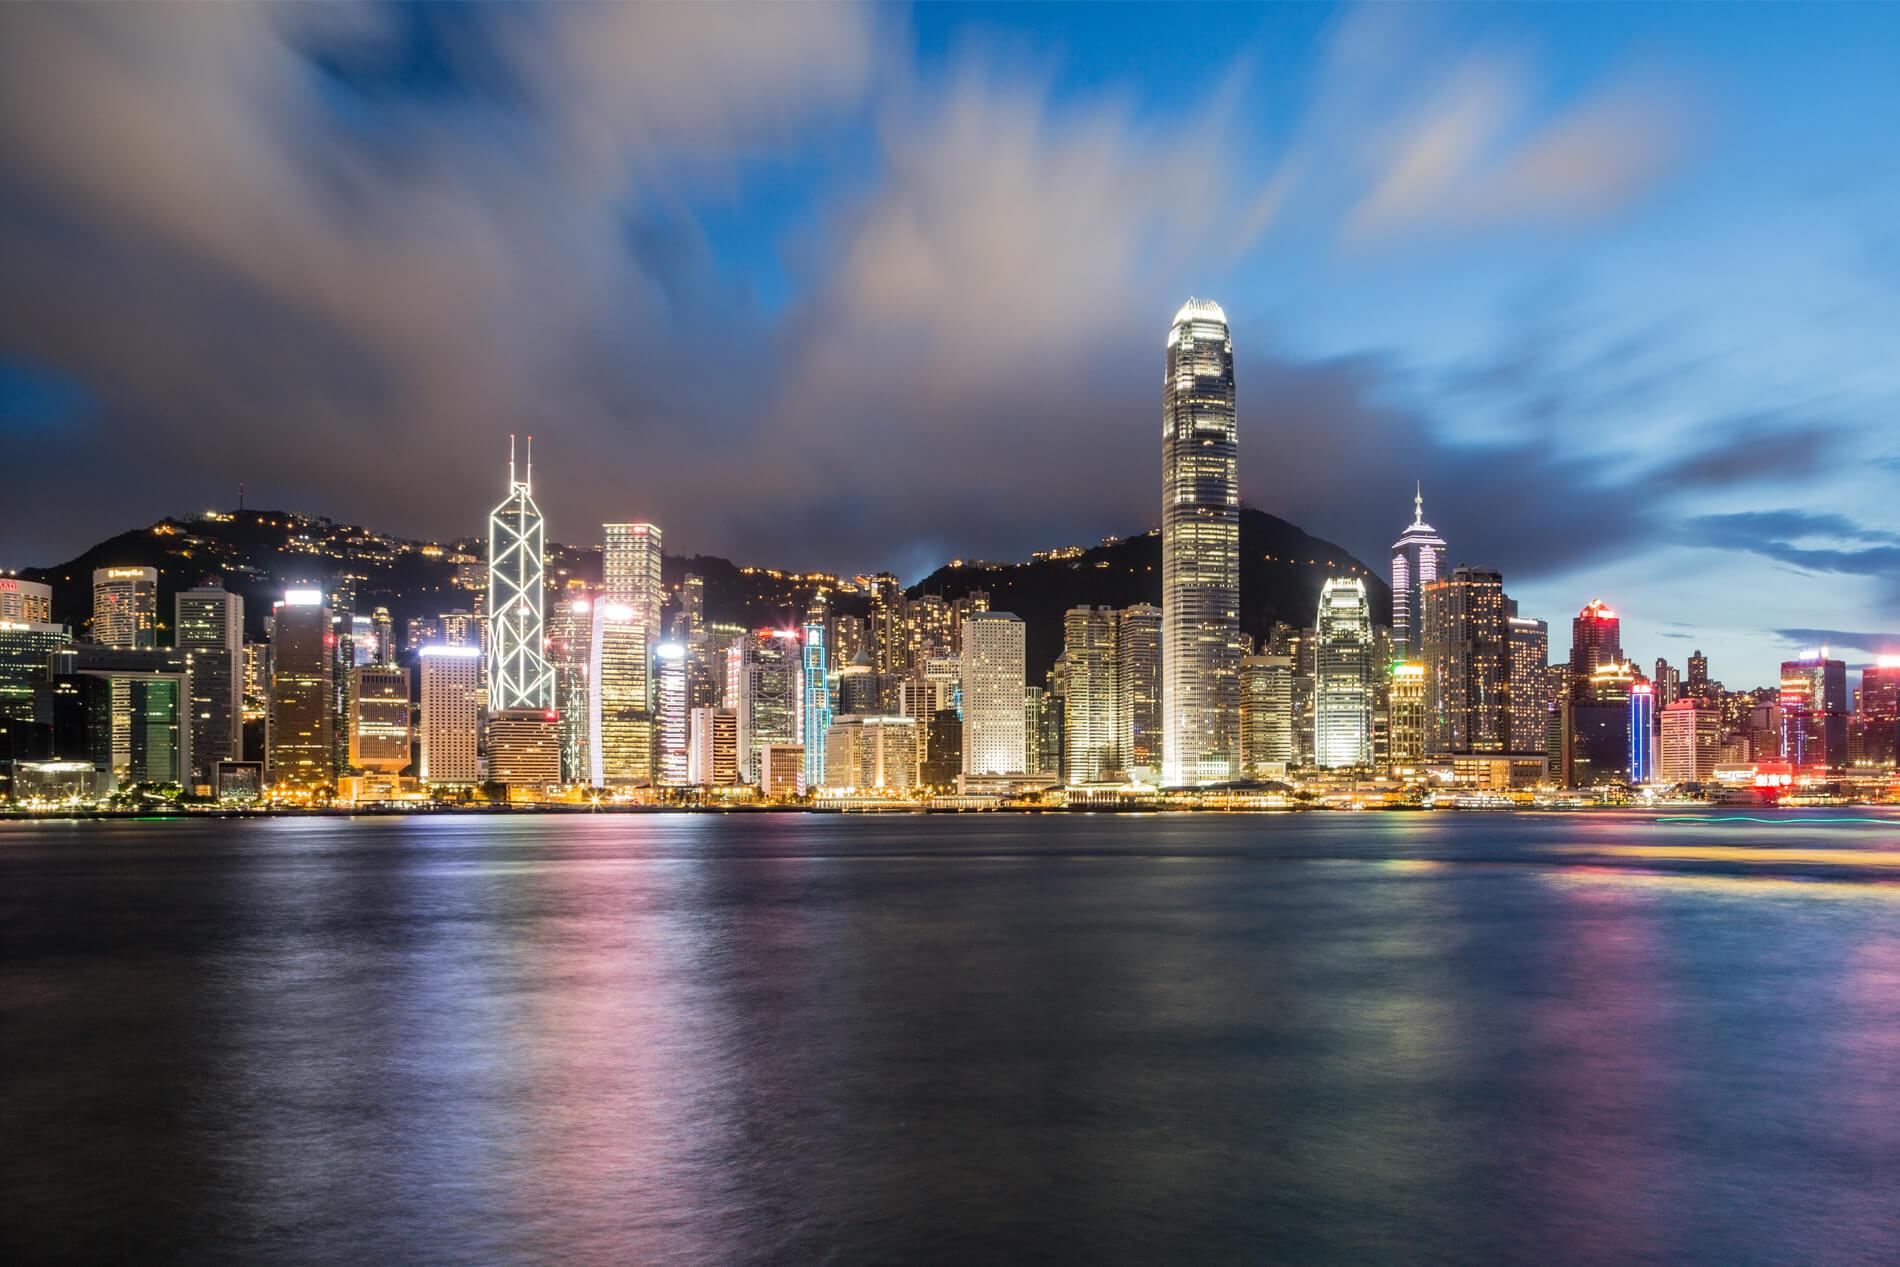 Hong Kong attracts Muslim tourists